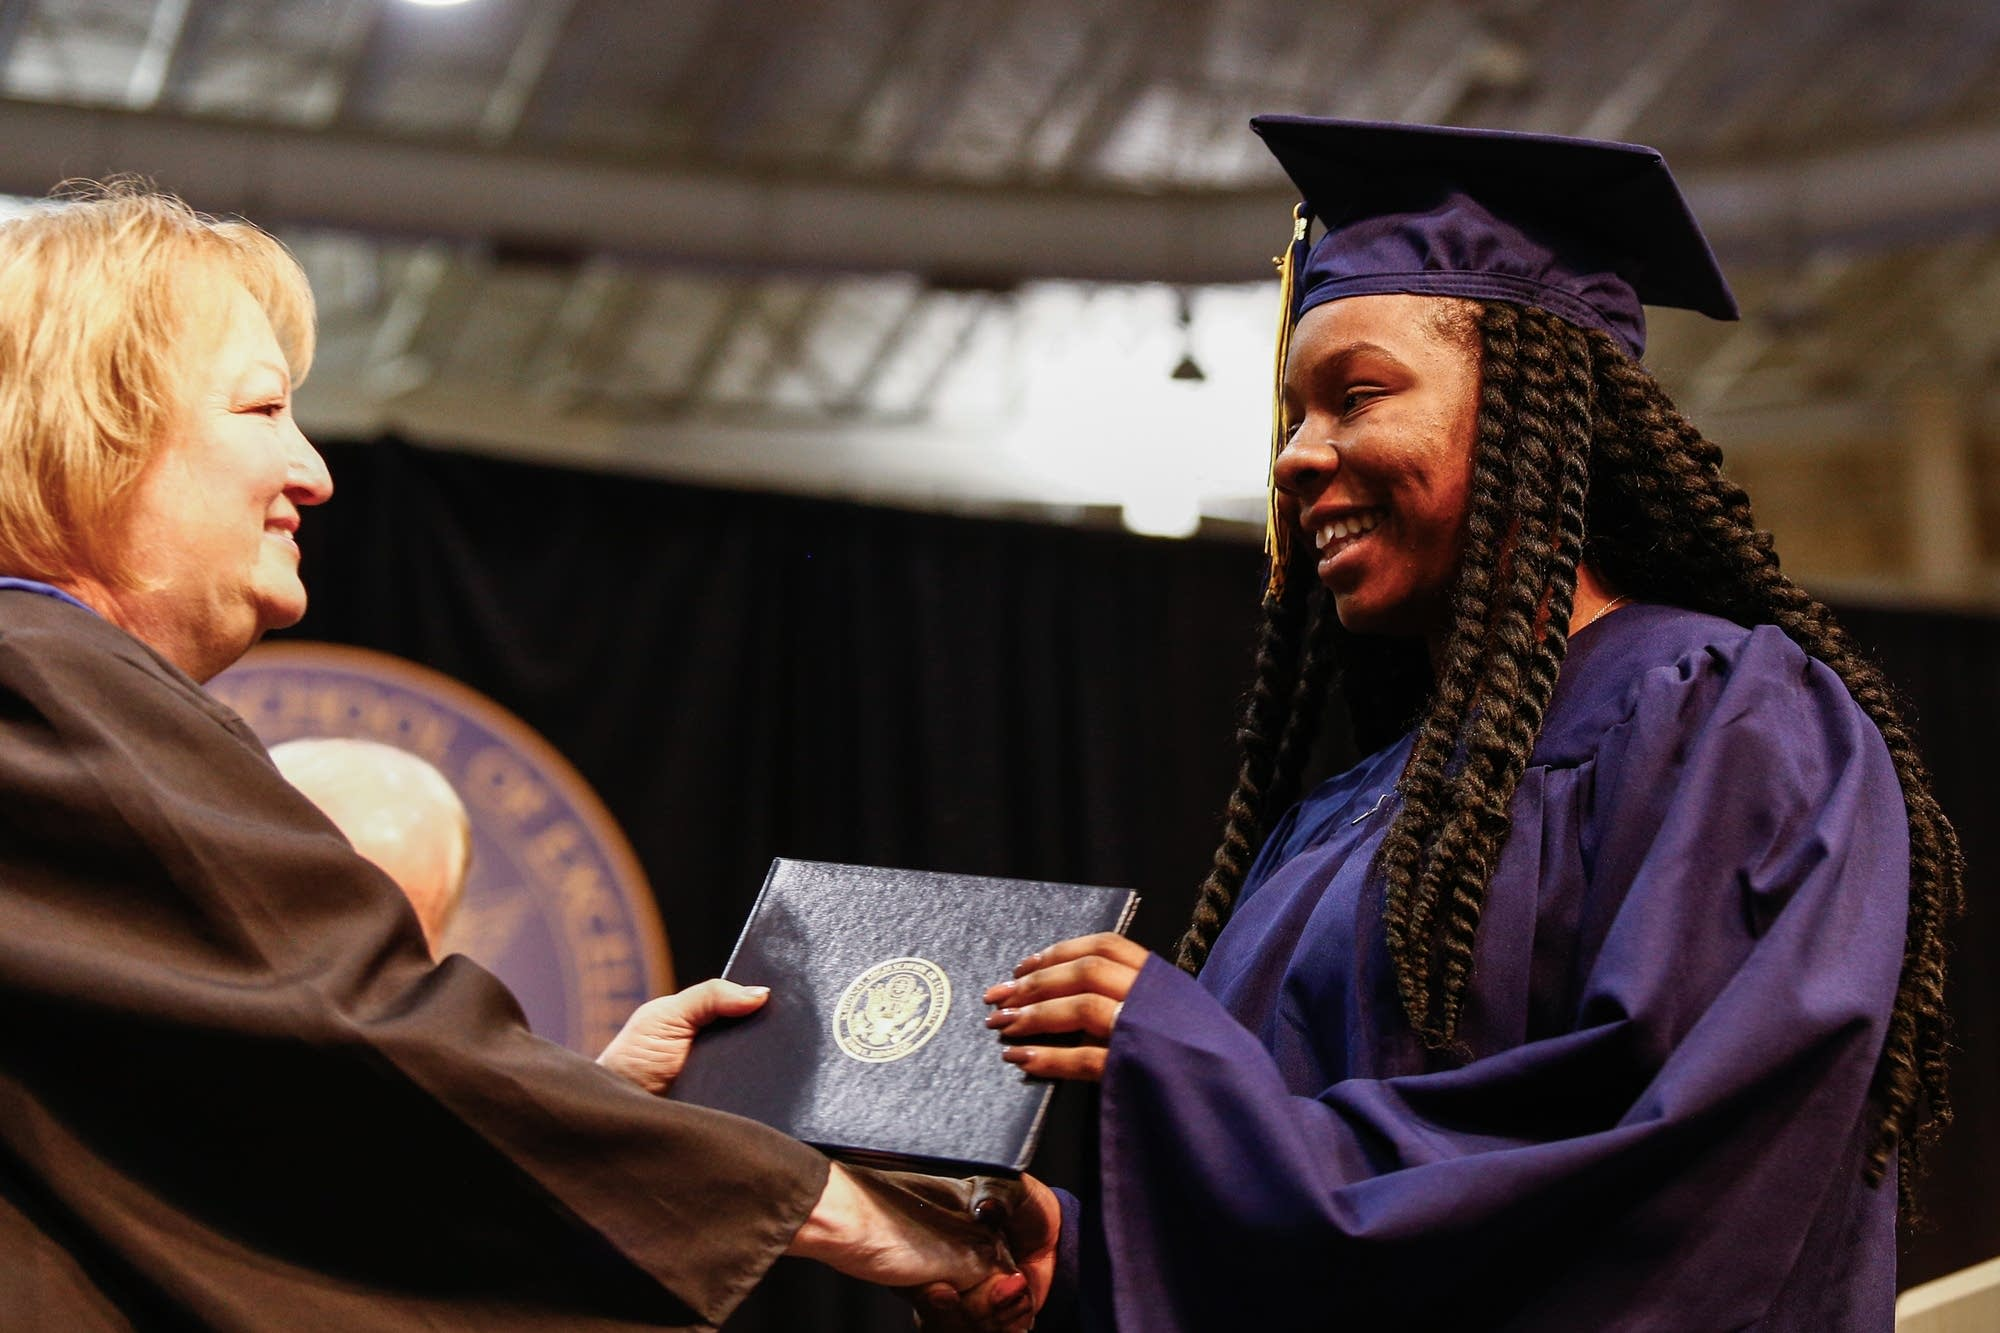 Diamond Syas receives her diploma.